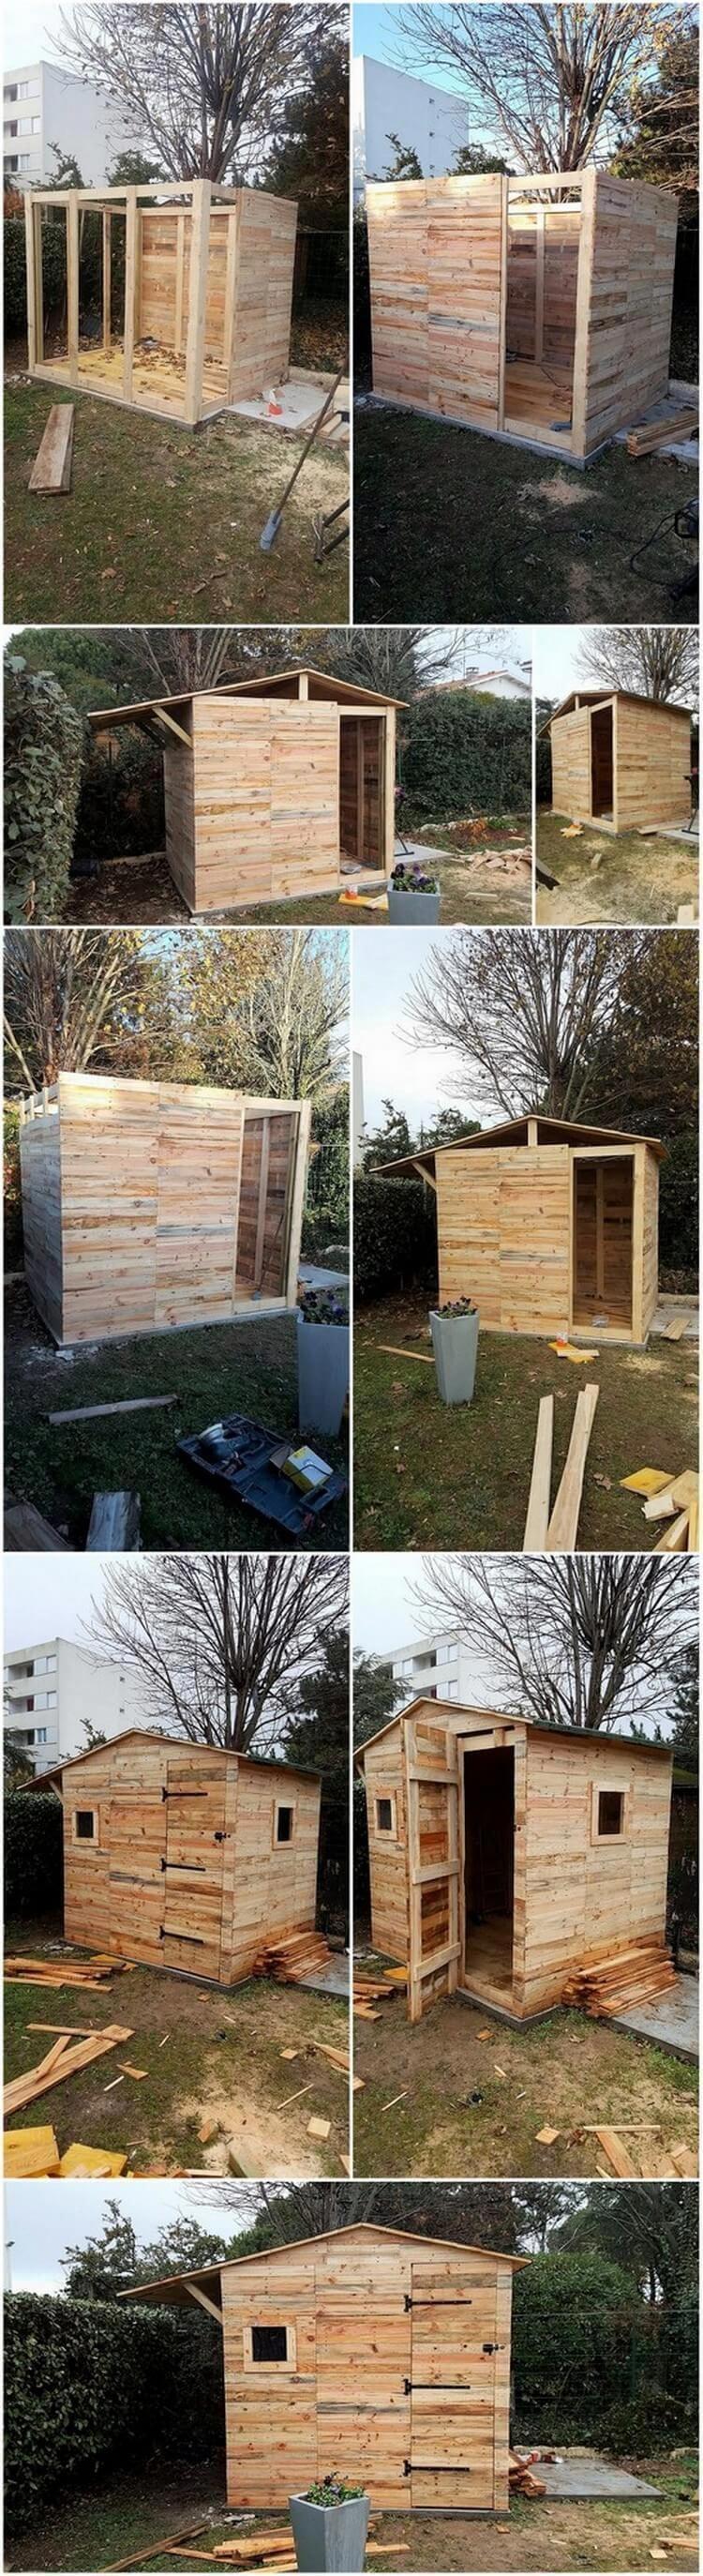 diy 10x12 storage shed plans